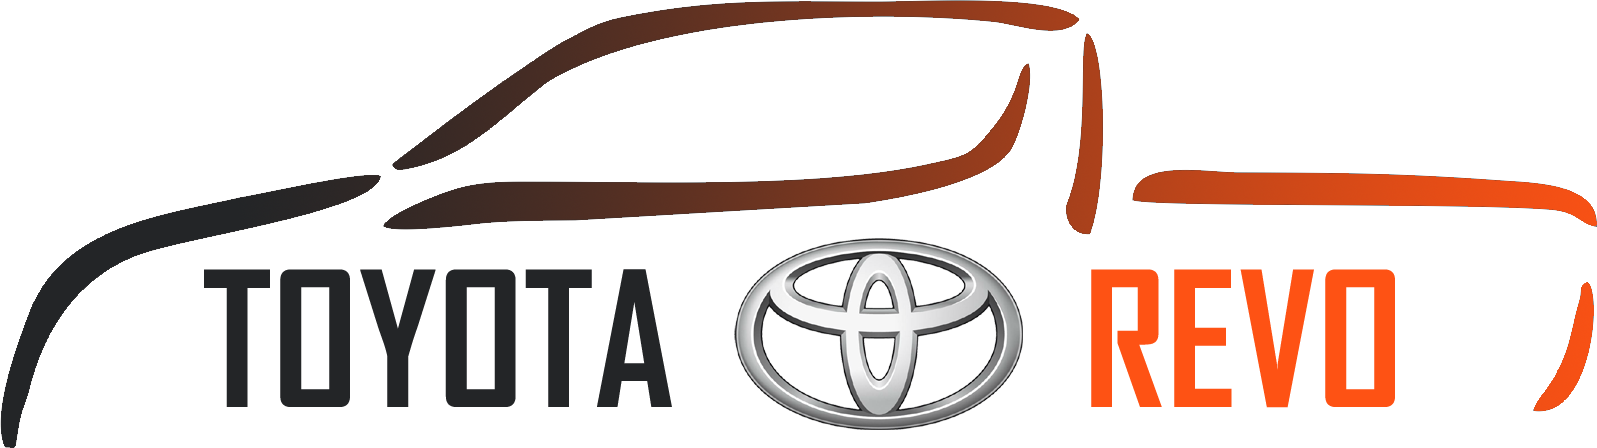 Trust motors Thailand  -Toyota Revo 2019 Rocco-Ford Raptor 2019 4×4 Diesel Pickups Exporter